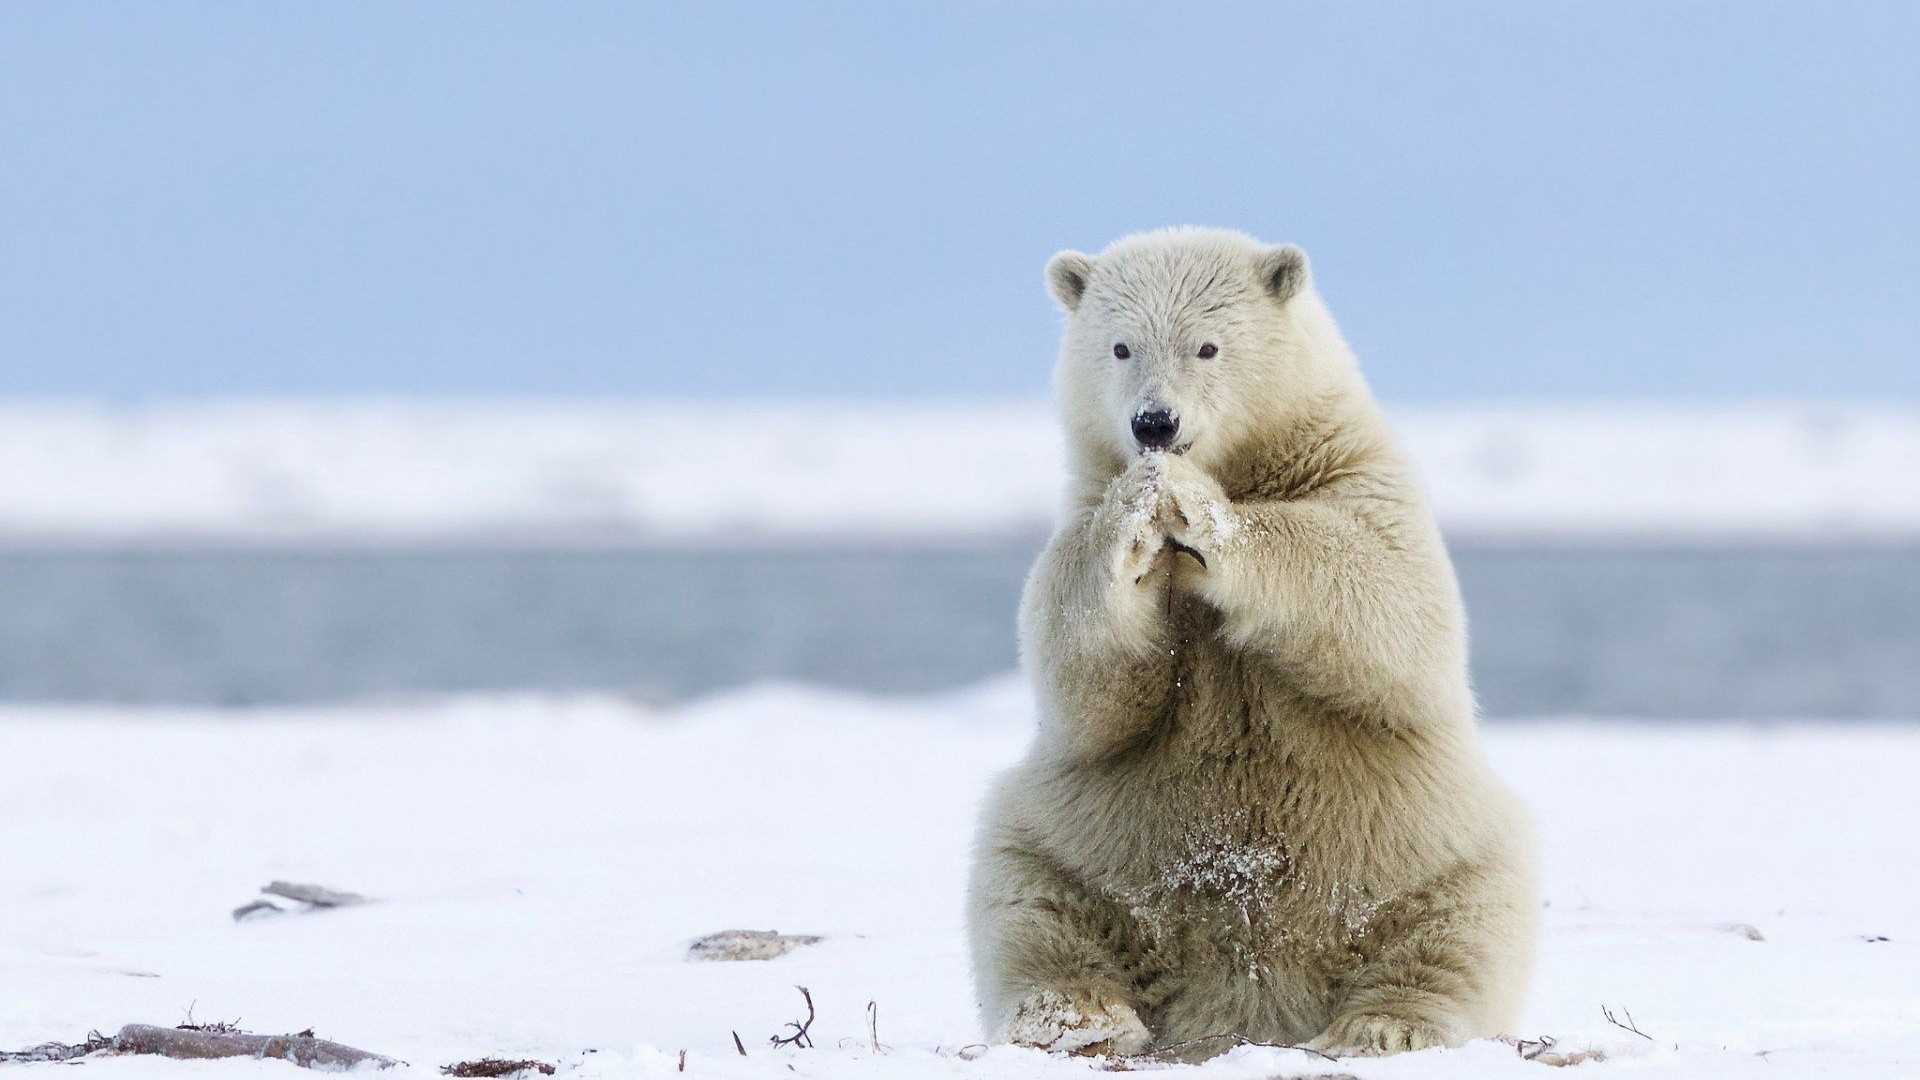 Polar Bear Wallpaper Desktop